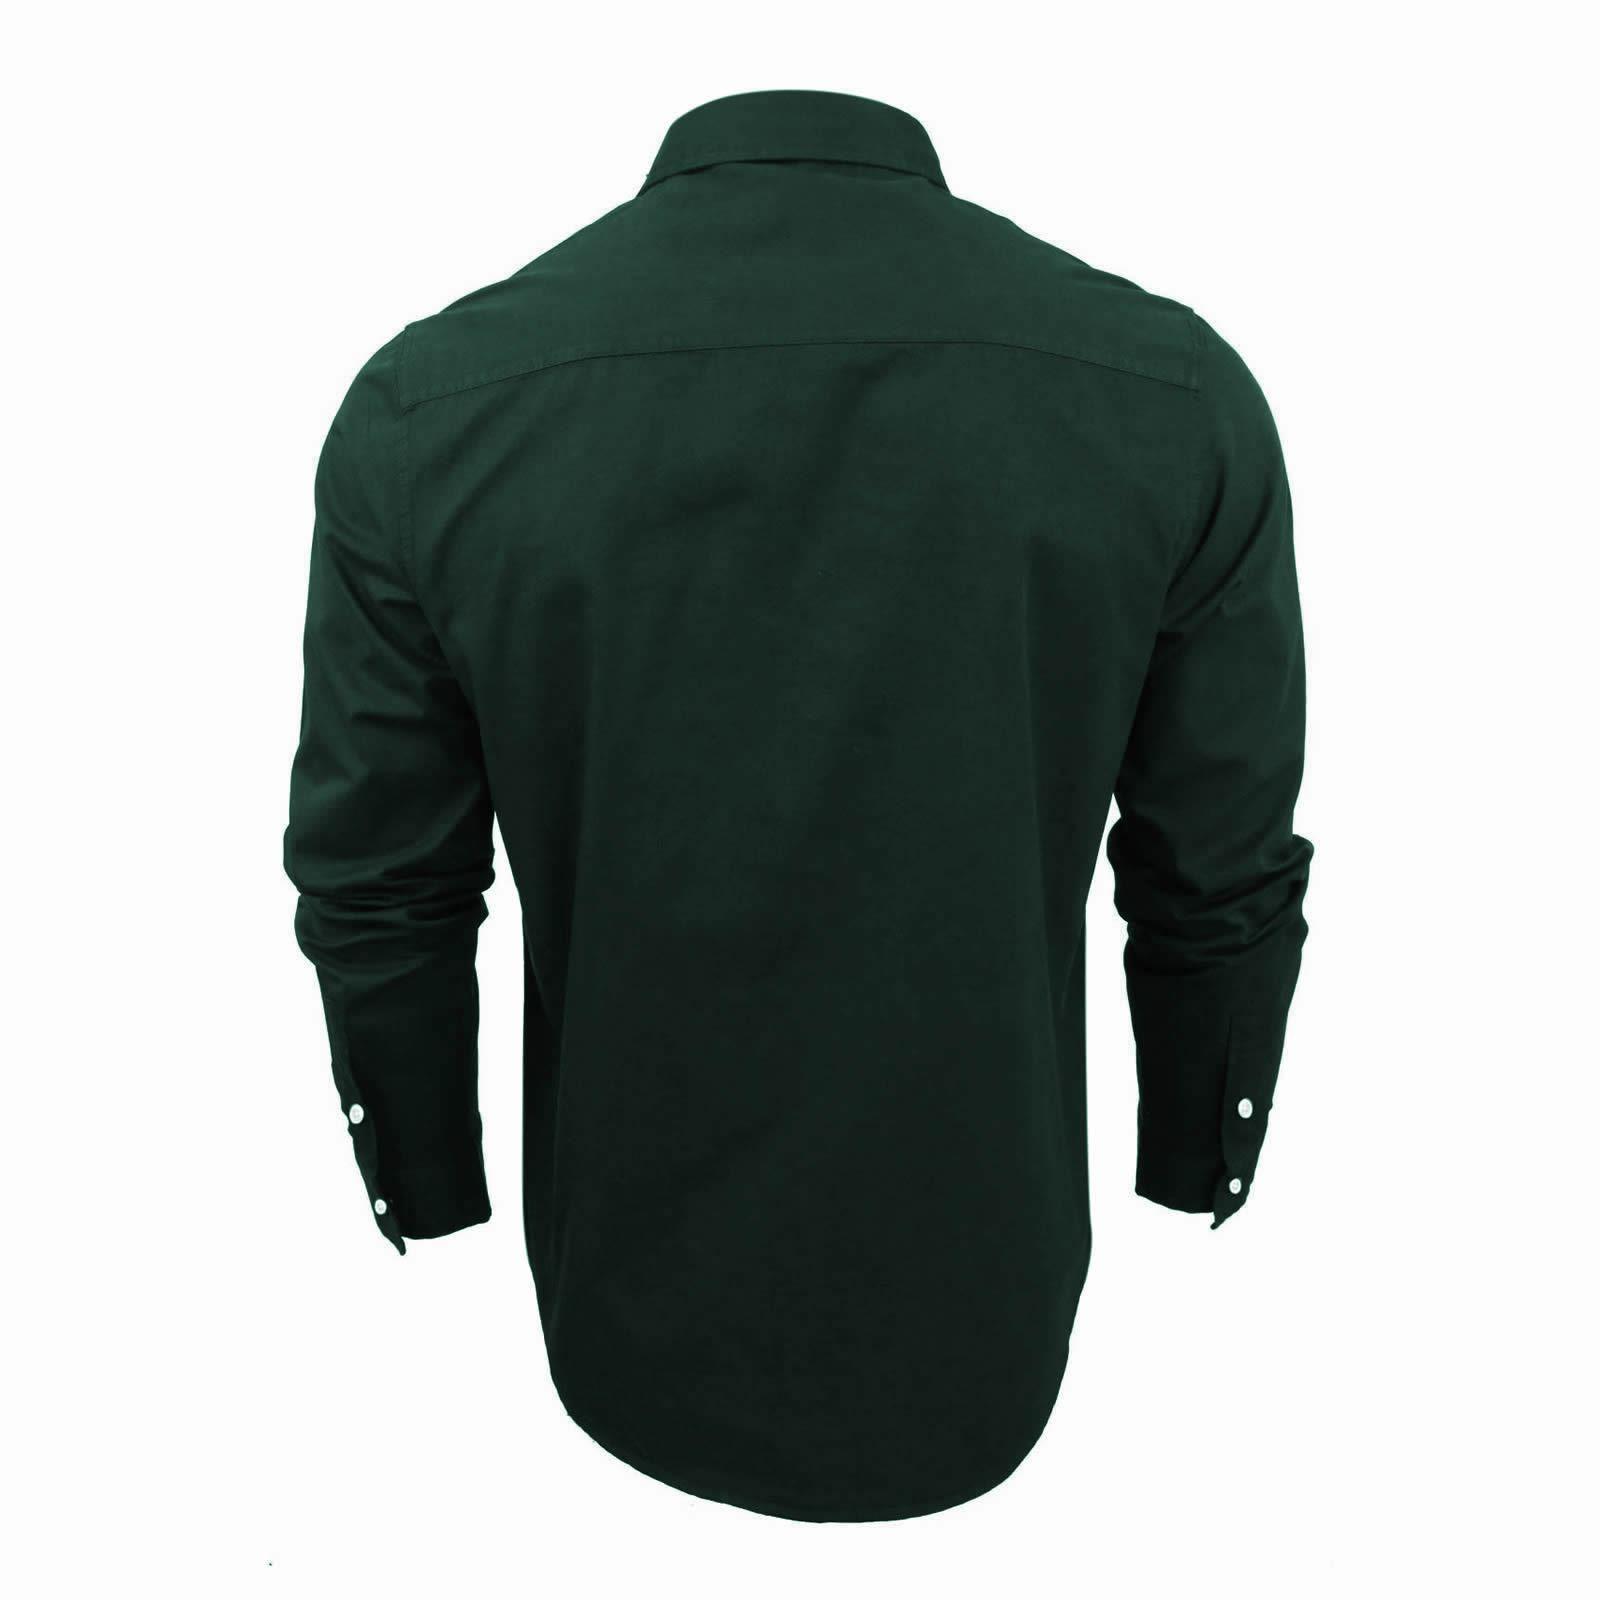 Mens-Shirt-Brave-Soul-Holmes-Long-Sleeve-Cotton-Canvas-Casual-Top thumbnail 3